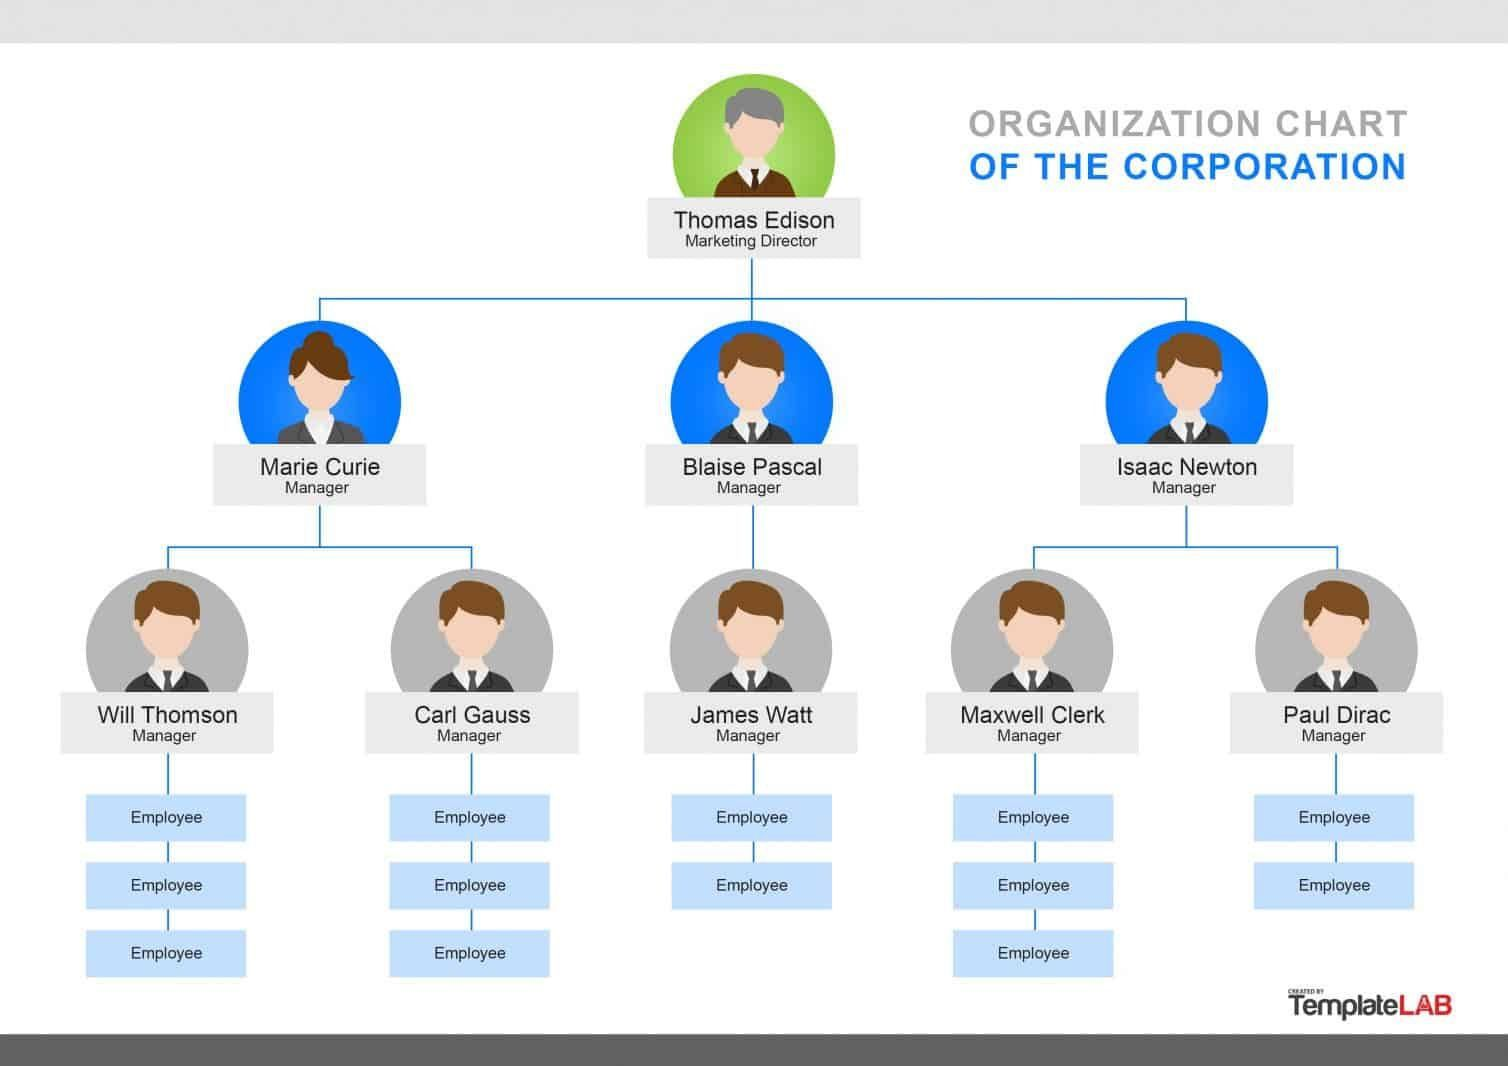 000 Beautiful Organization Chart Template Excel Download High Resolution  Org Organizational Format InFull